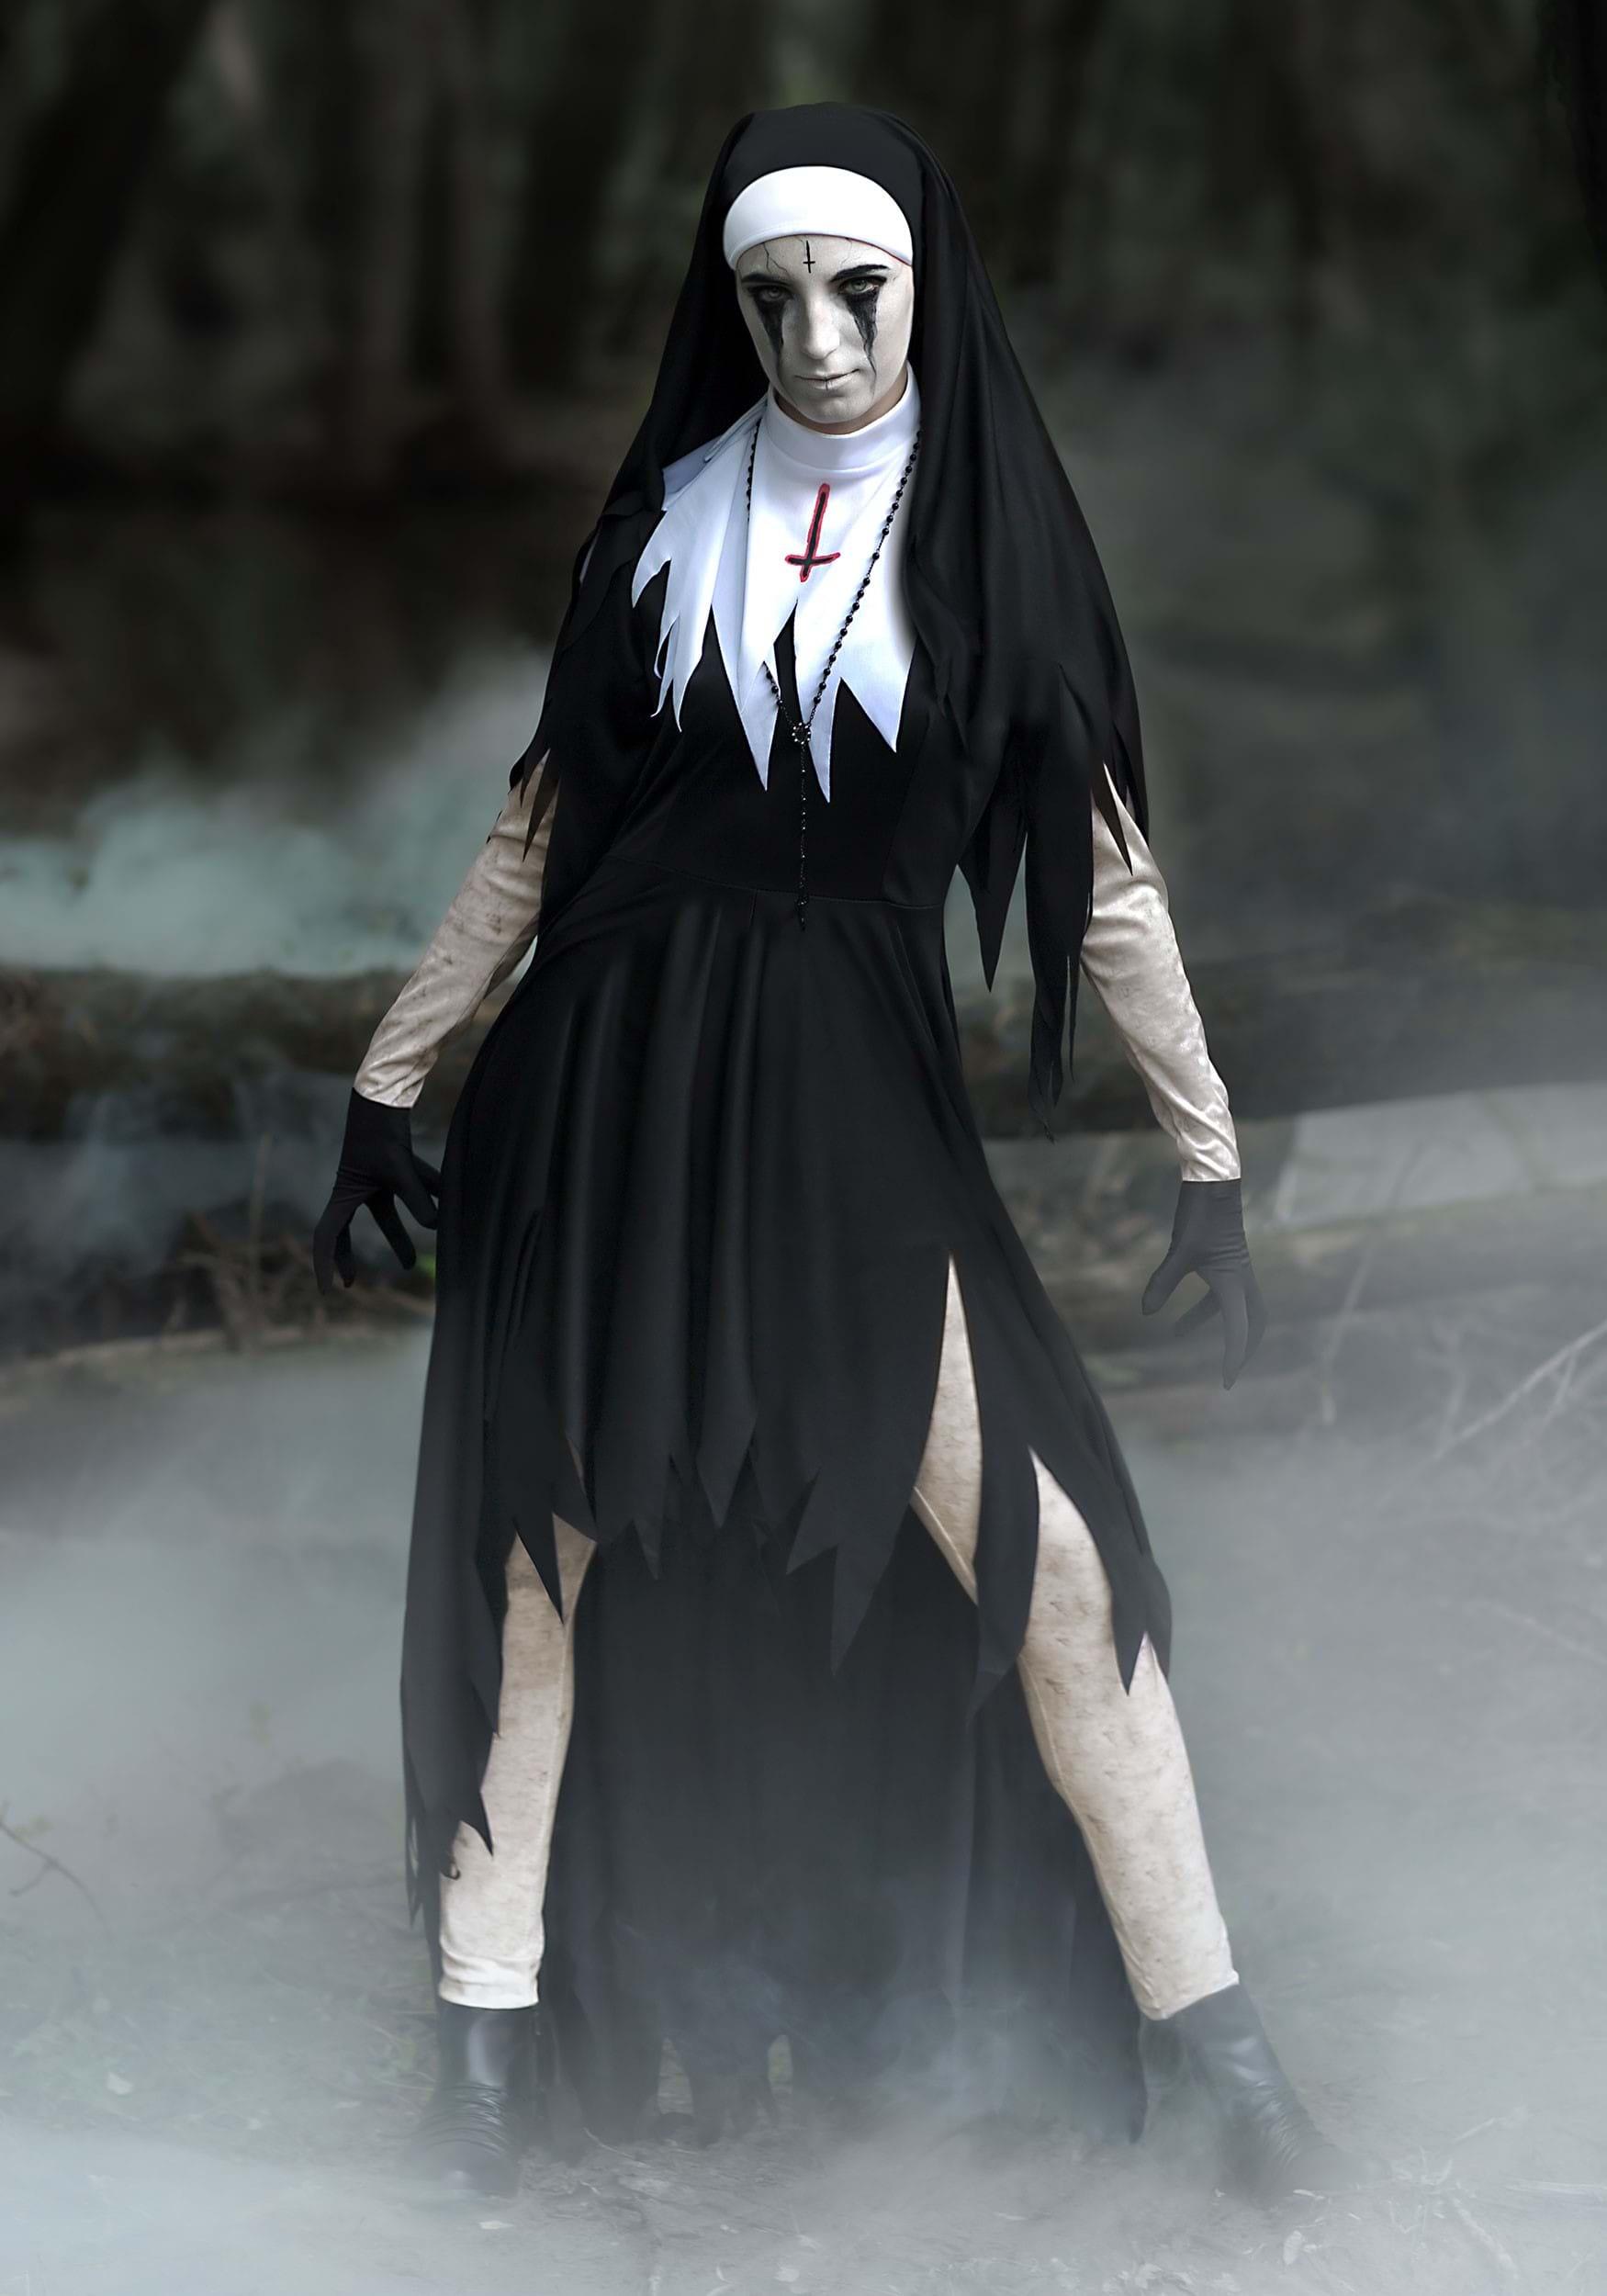 Dreadful Nun Womenu0027s Costume  sc 1 st  Fun.com & Dreadful Nun Costume for Women